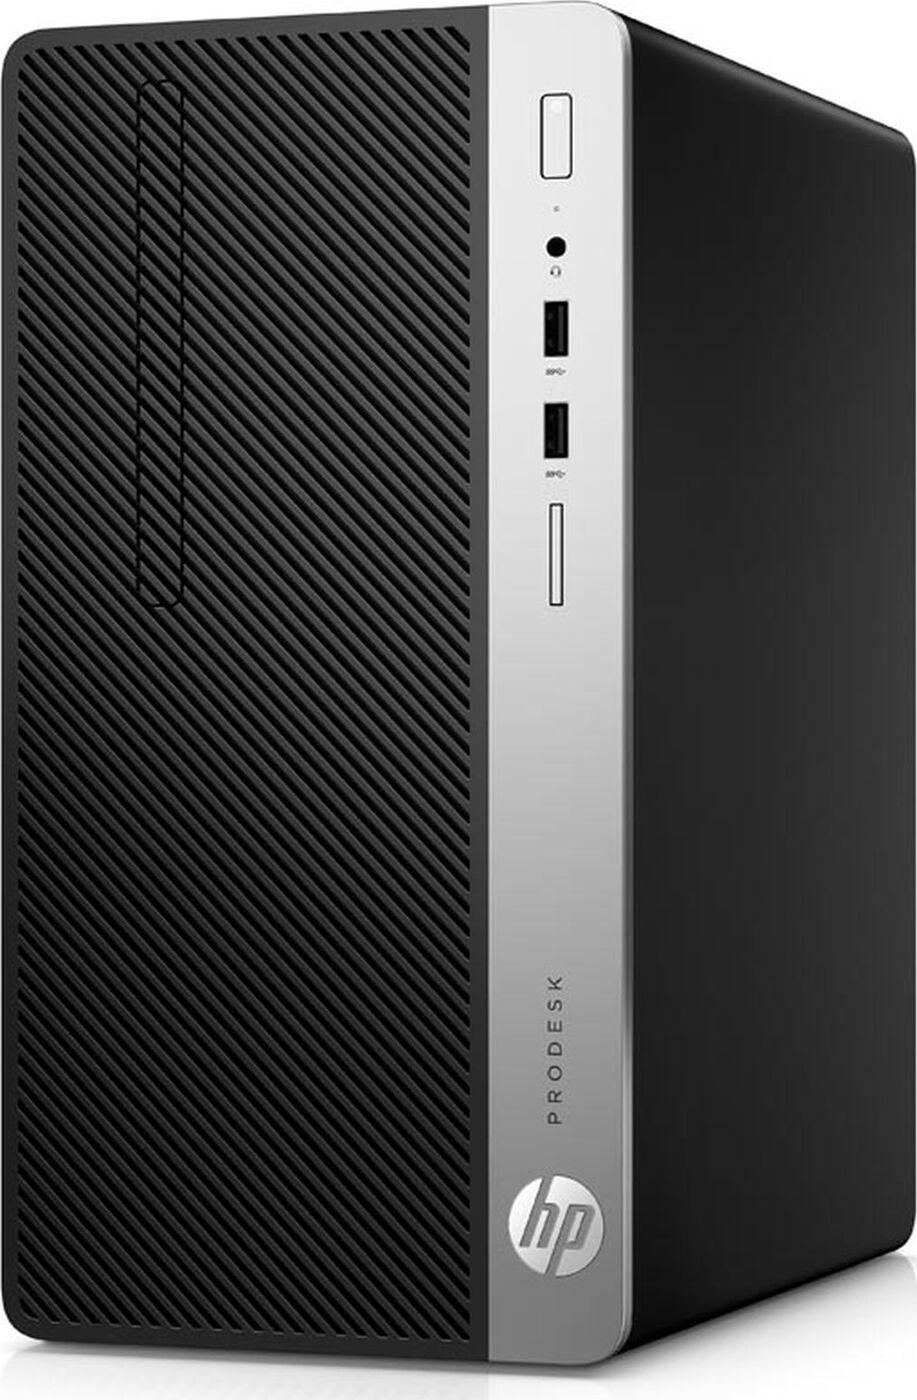 Мини ПК HP ProDesk 400 G6 MT Intel Core i3 9100(3.6Ghz)/8192Mb/256PCISSDGb/DVDrw/war 1y/W10Pro + HP HDMI Port (Repl 1JJ53EA)